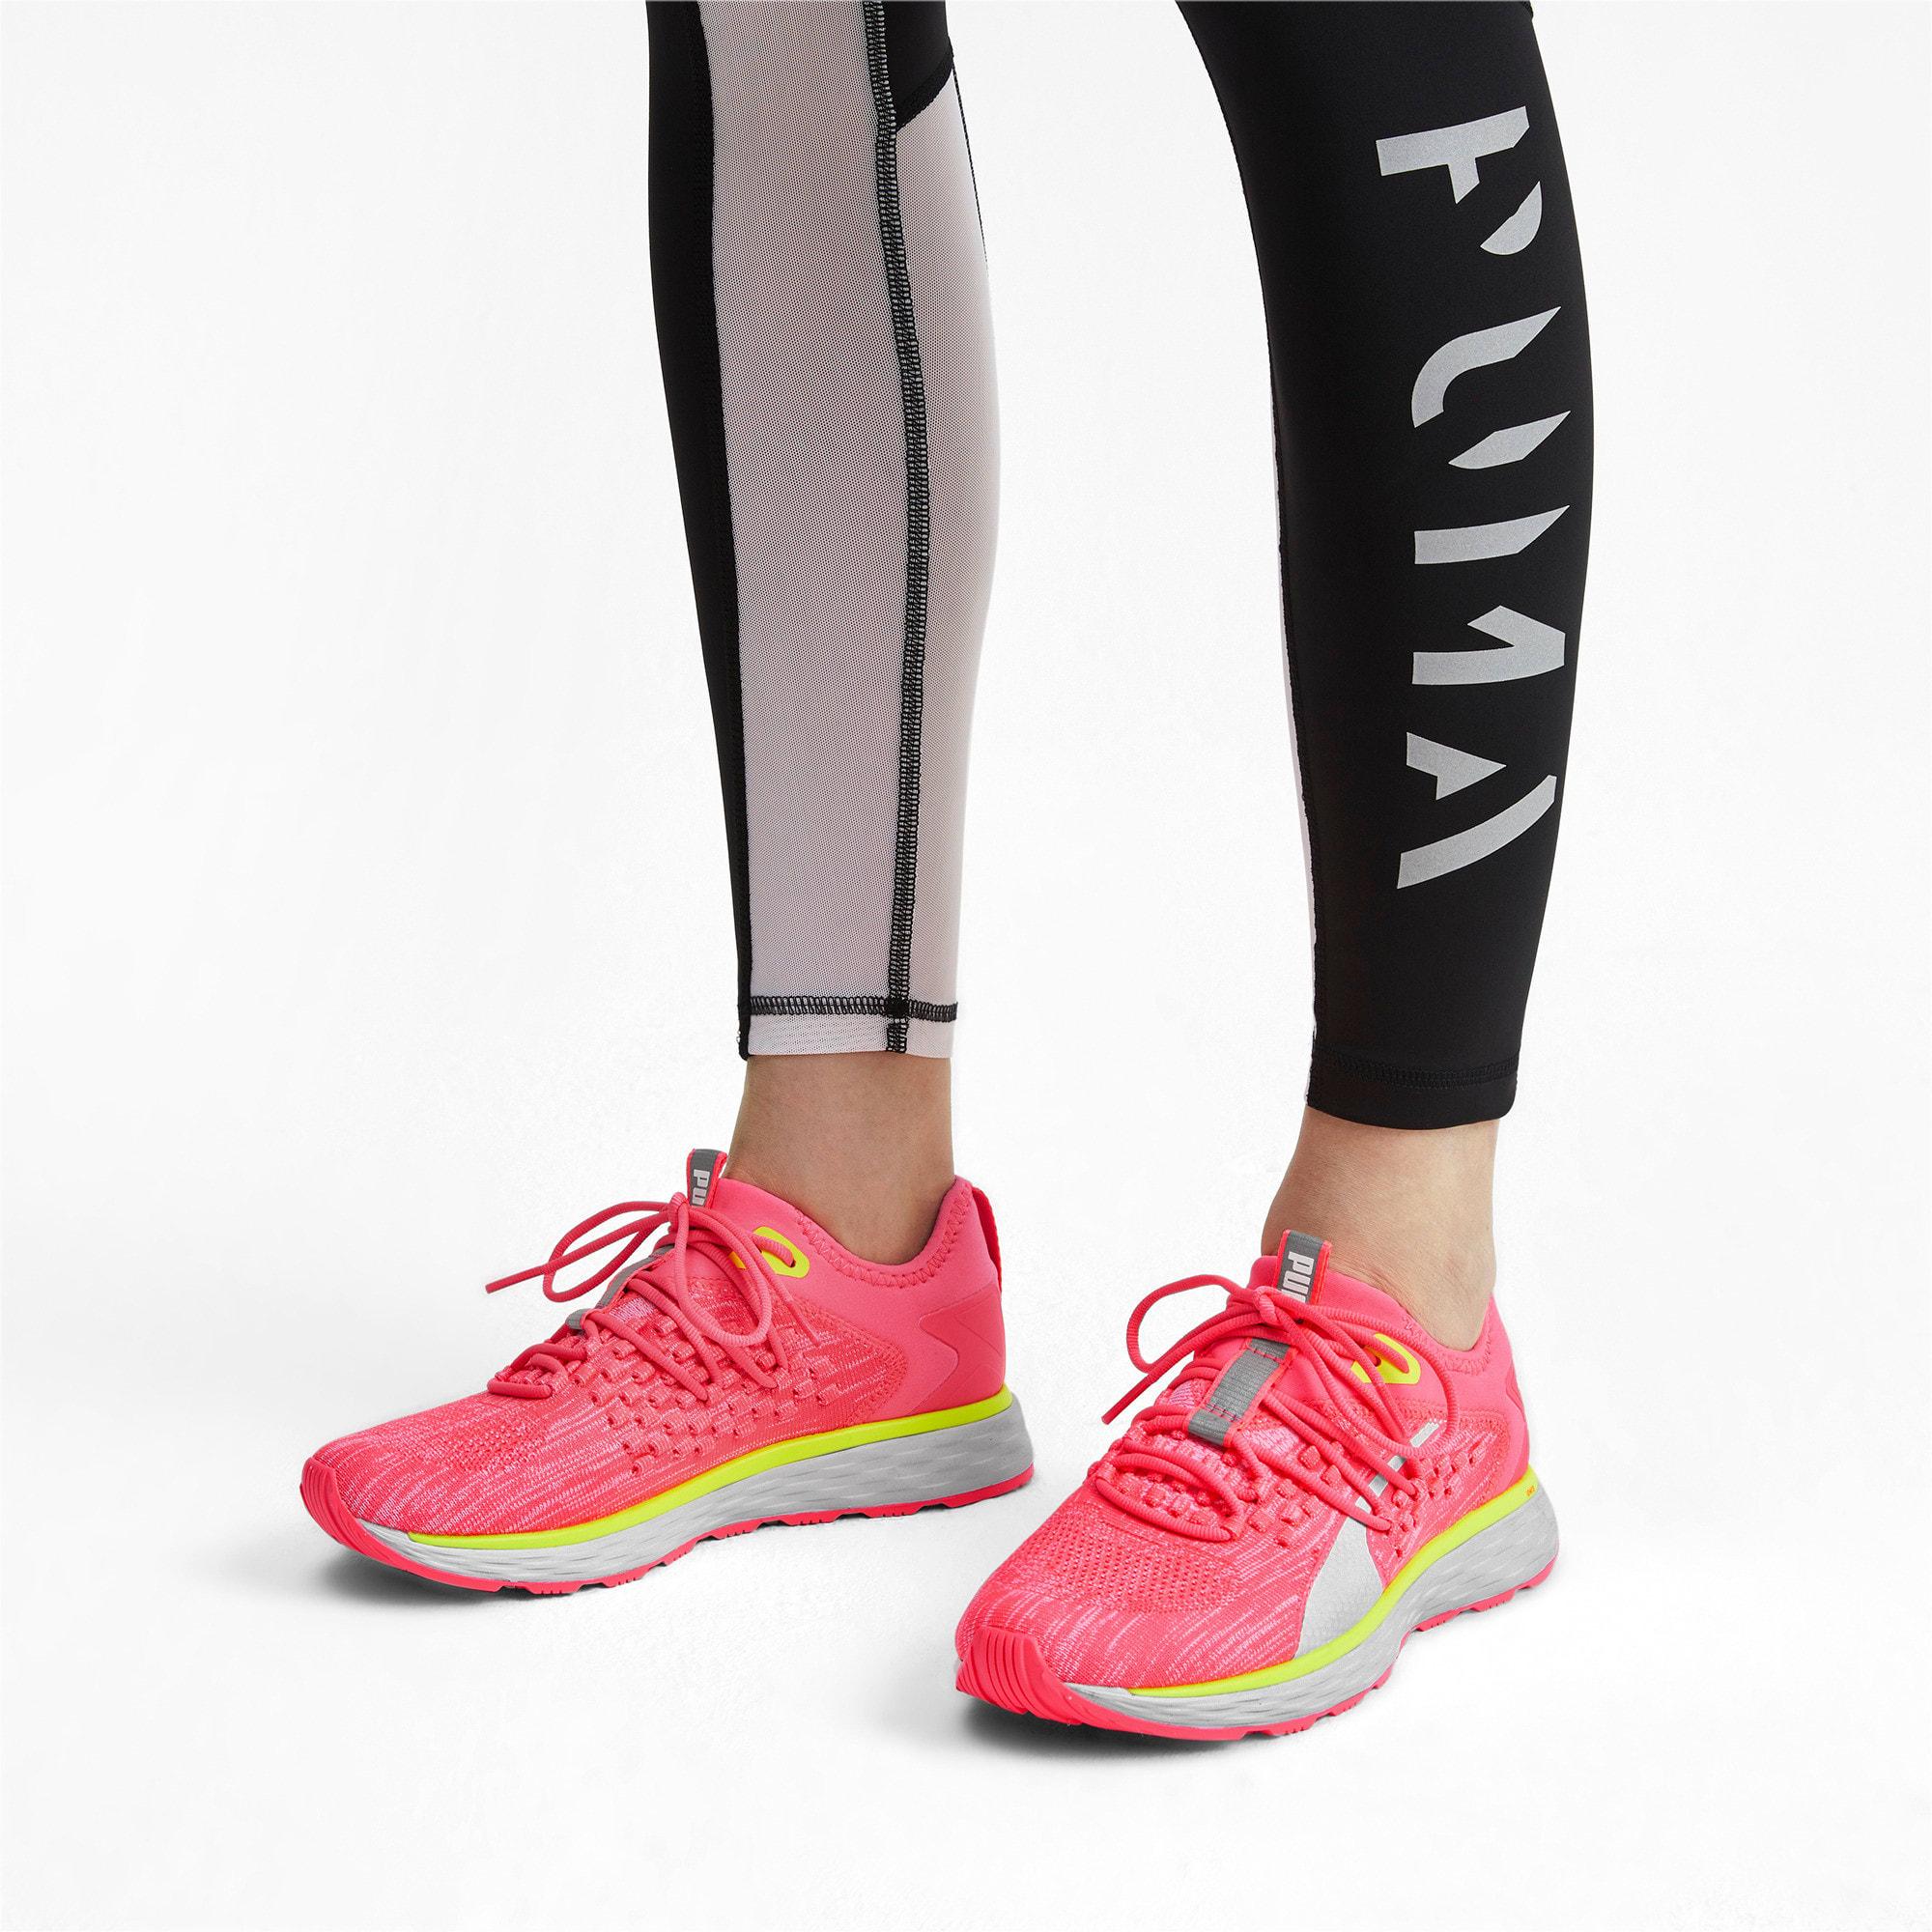 Thumbnail 2 of SPEED FUSEFIT Women's Running Shoes, Pink Alert-Puma White, medium-IND